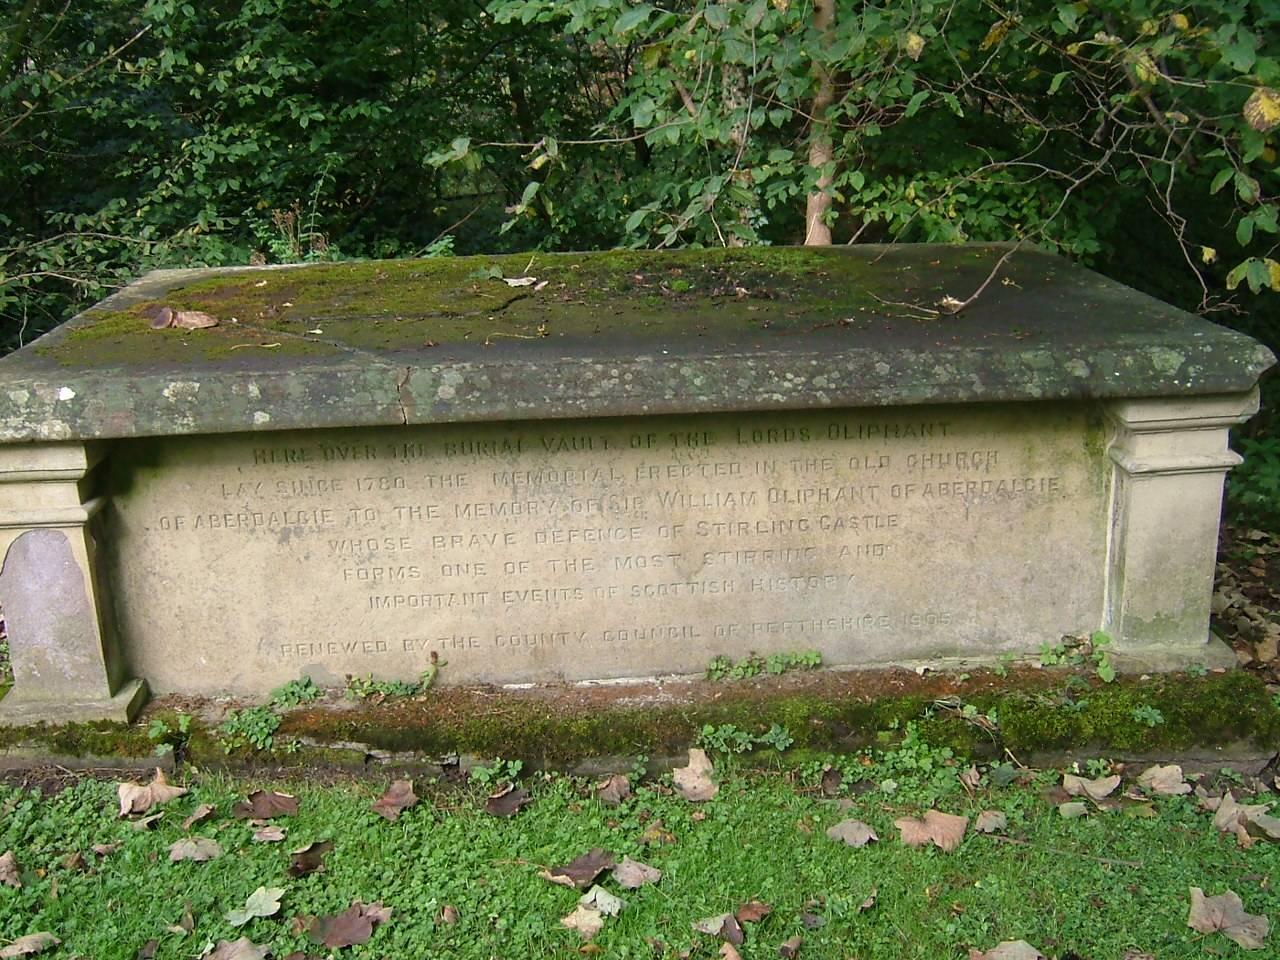 Oliphant tomb